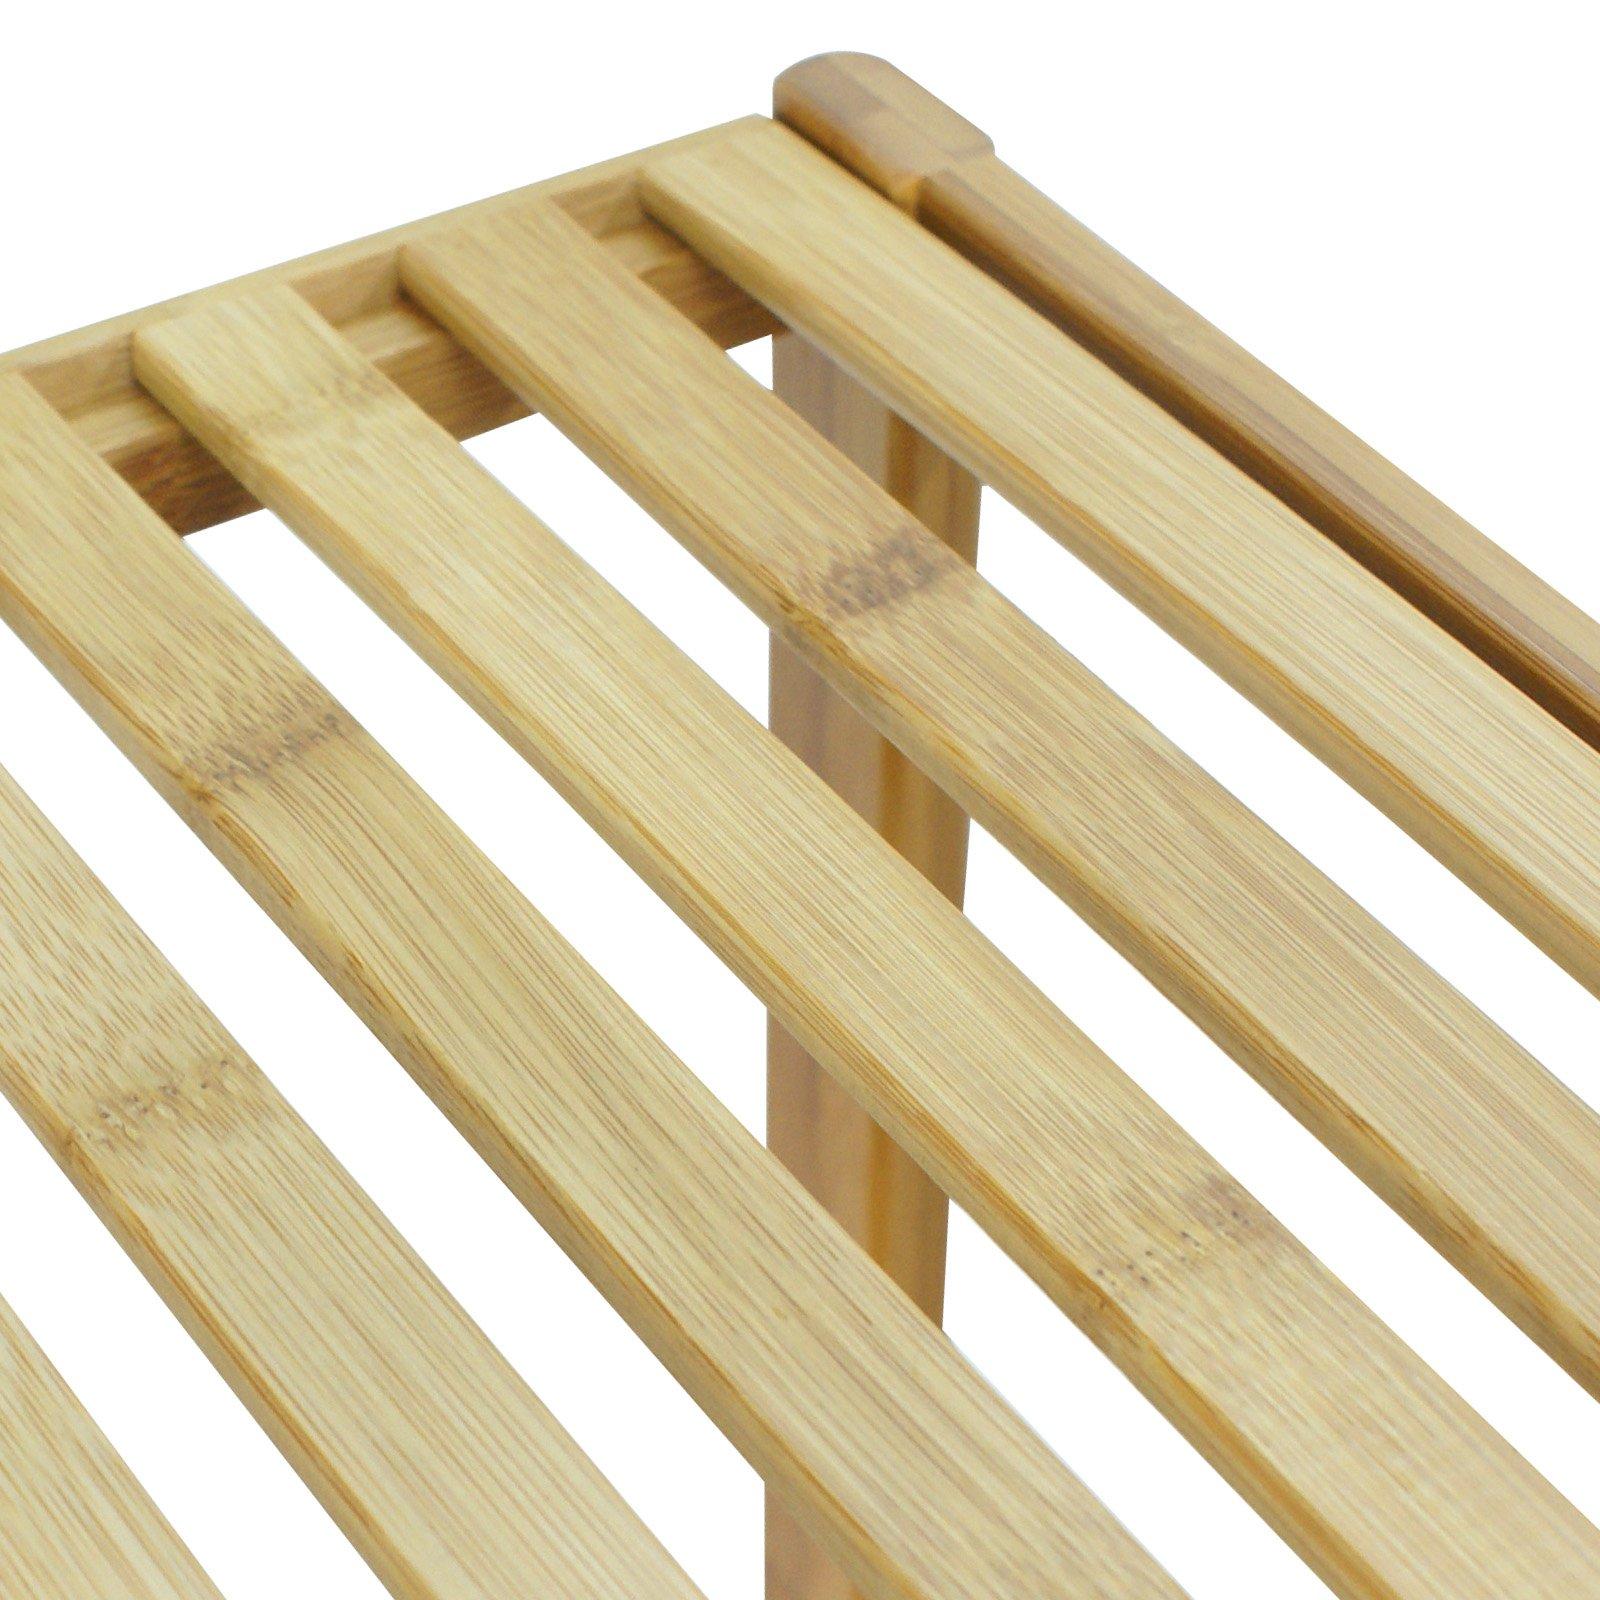 Smartxchoices 5 Tier 100% Bamboo Bathroom Organizer Standing Shelf Towel  Rack Free Standing Shelves Units Wood Storage Rack Corner Bookshelf Plant